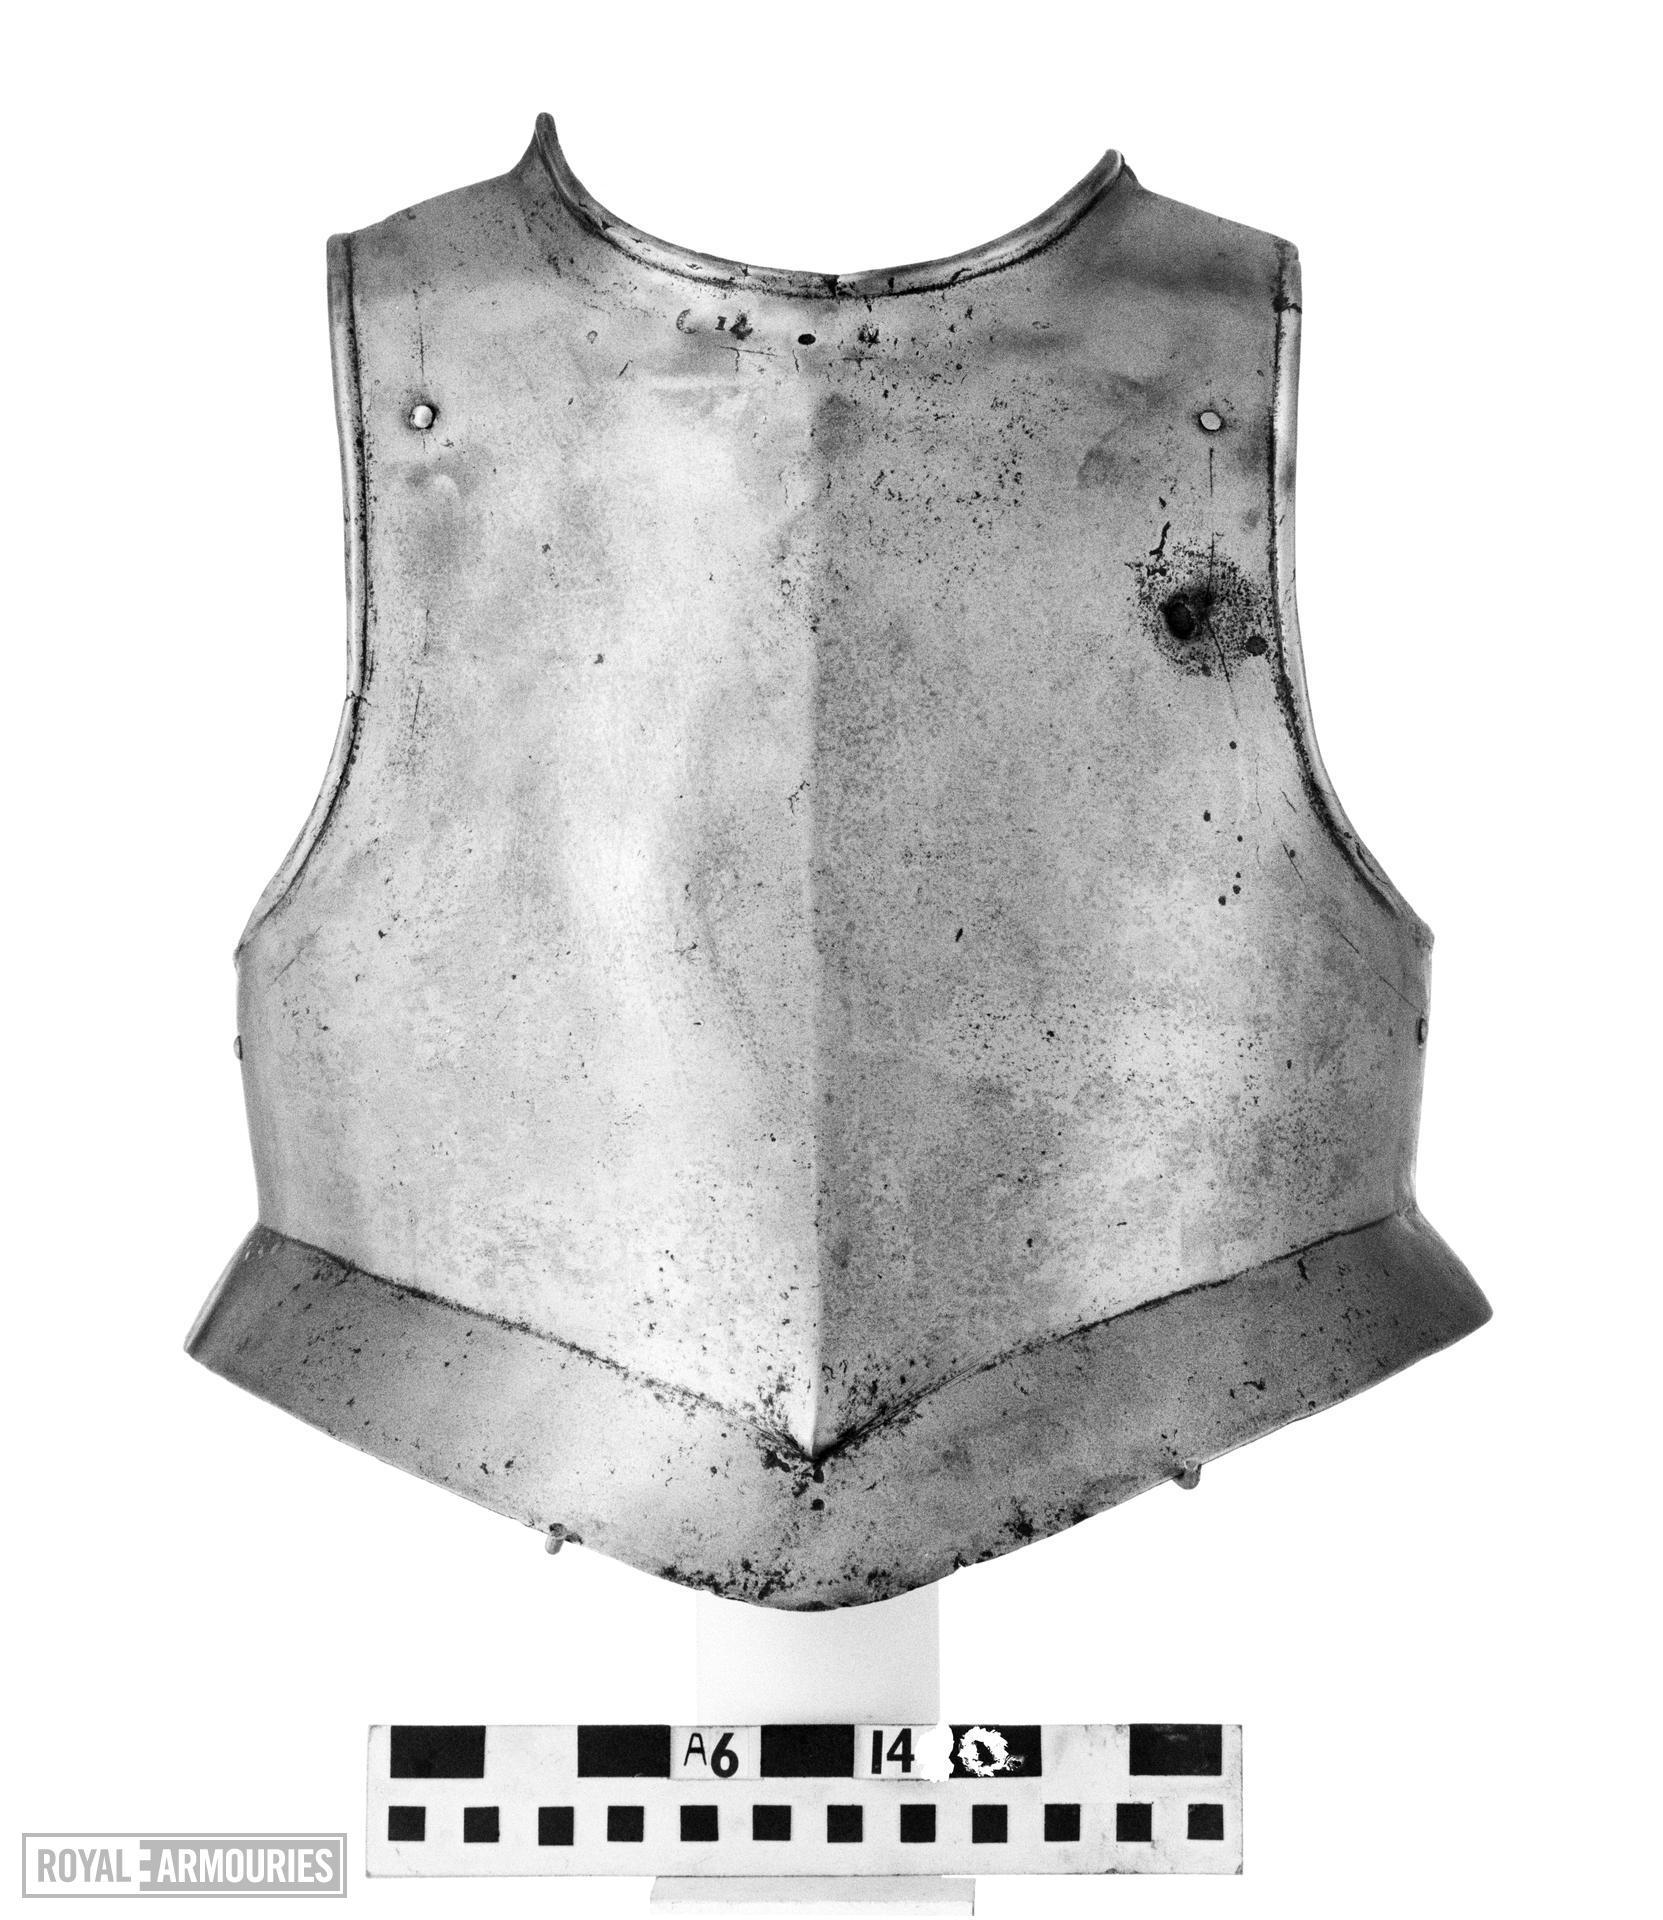 Harquebusier's breastplate